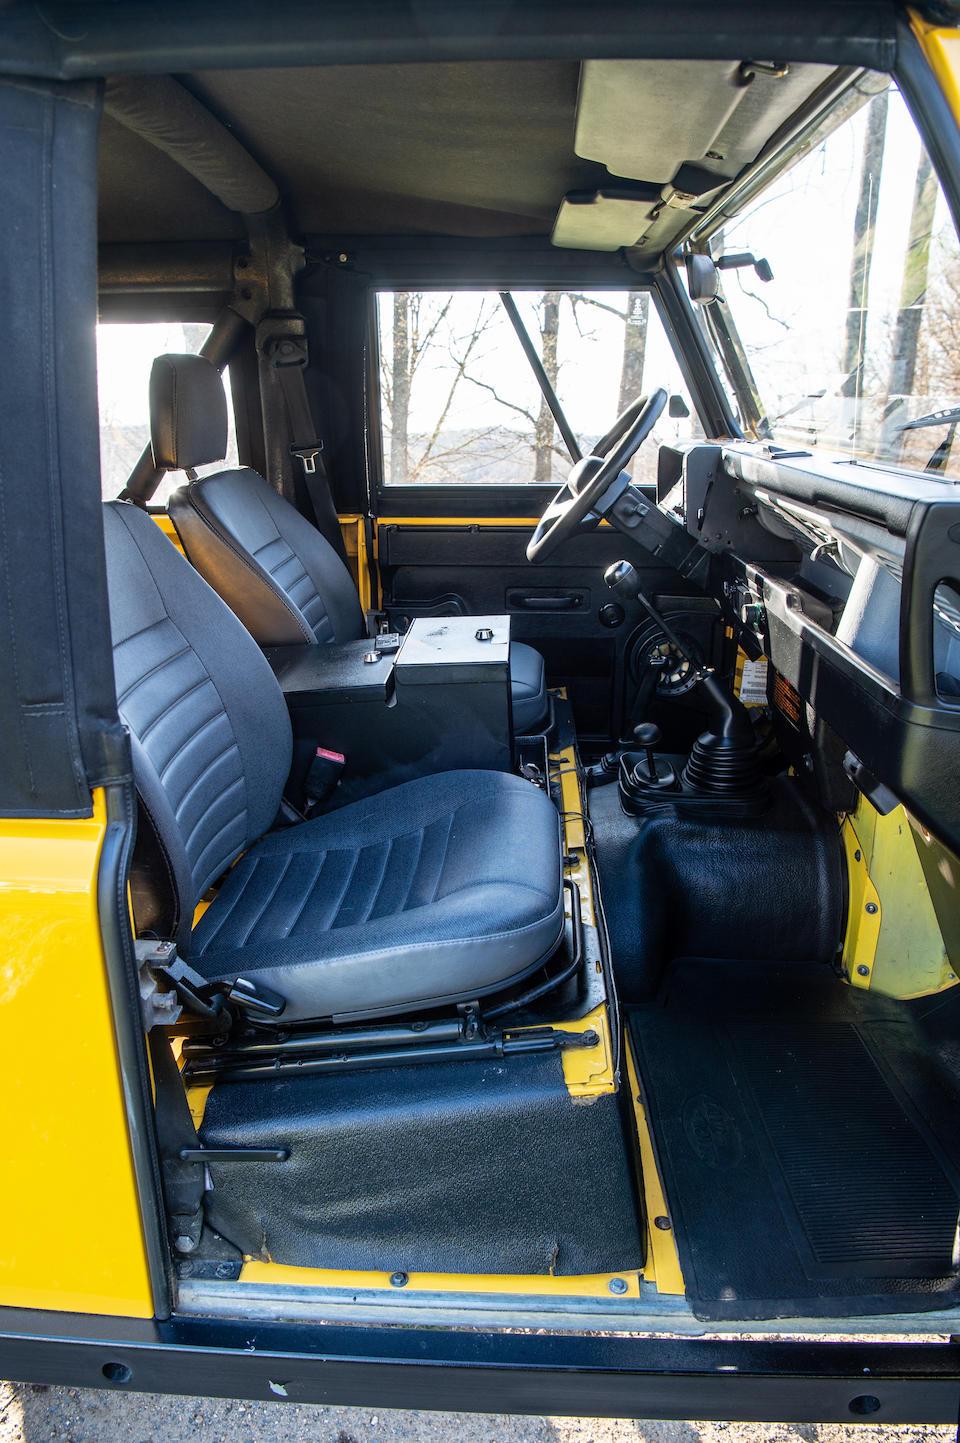 <b>1994 Land Rover Defender 90 NAS  </b><br />VIN. SALDV2285RA945303